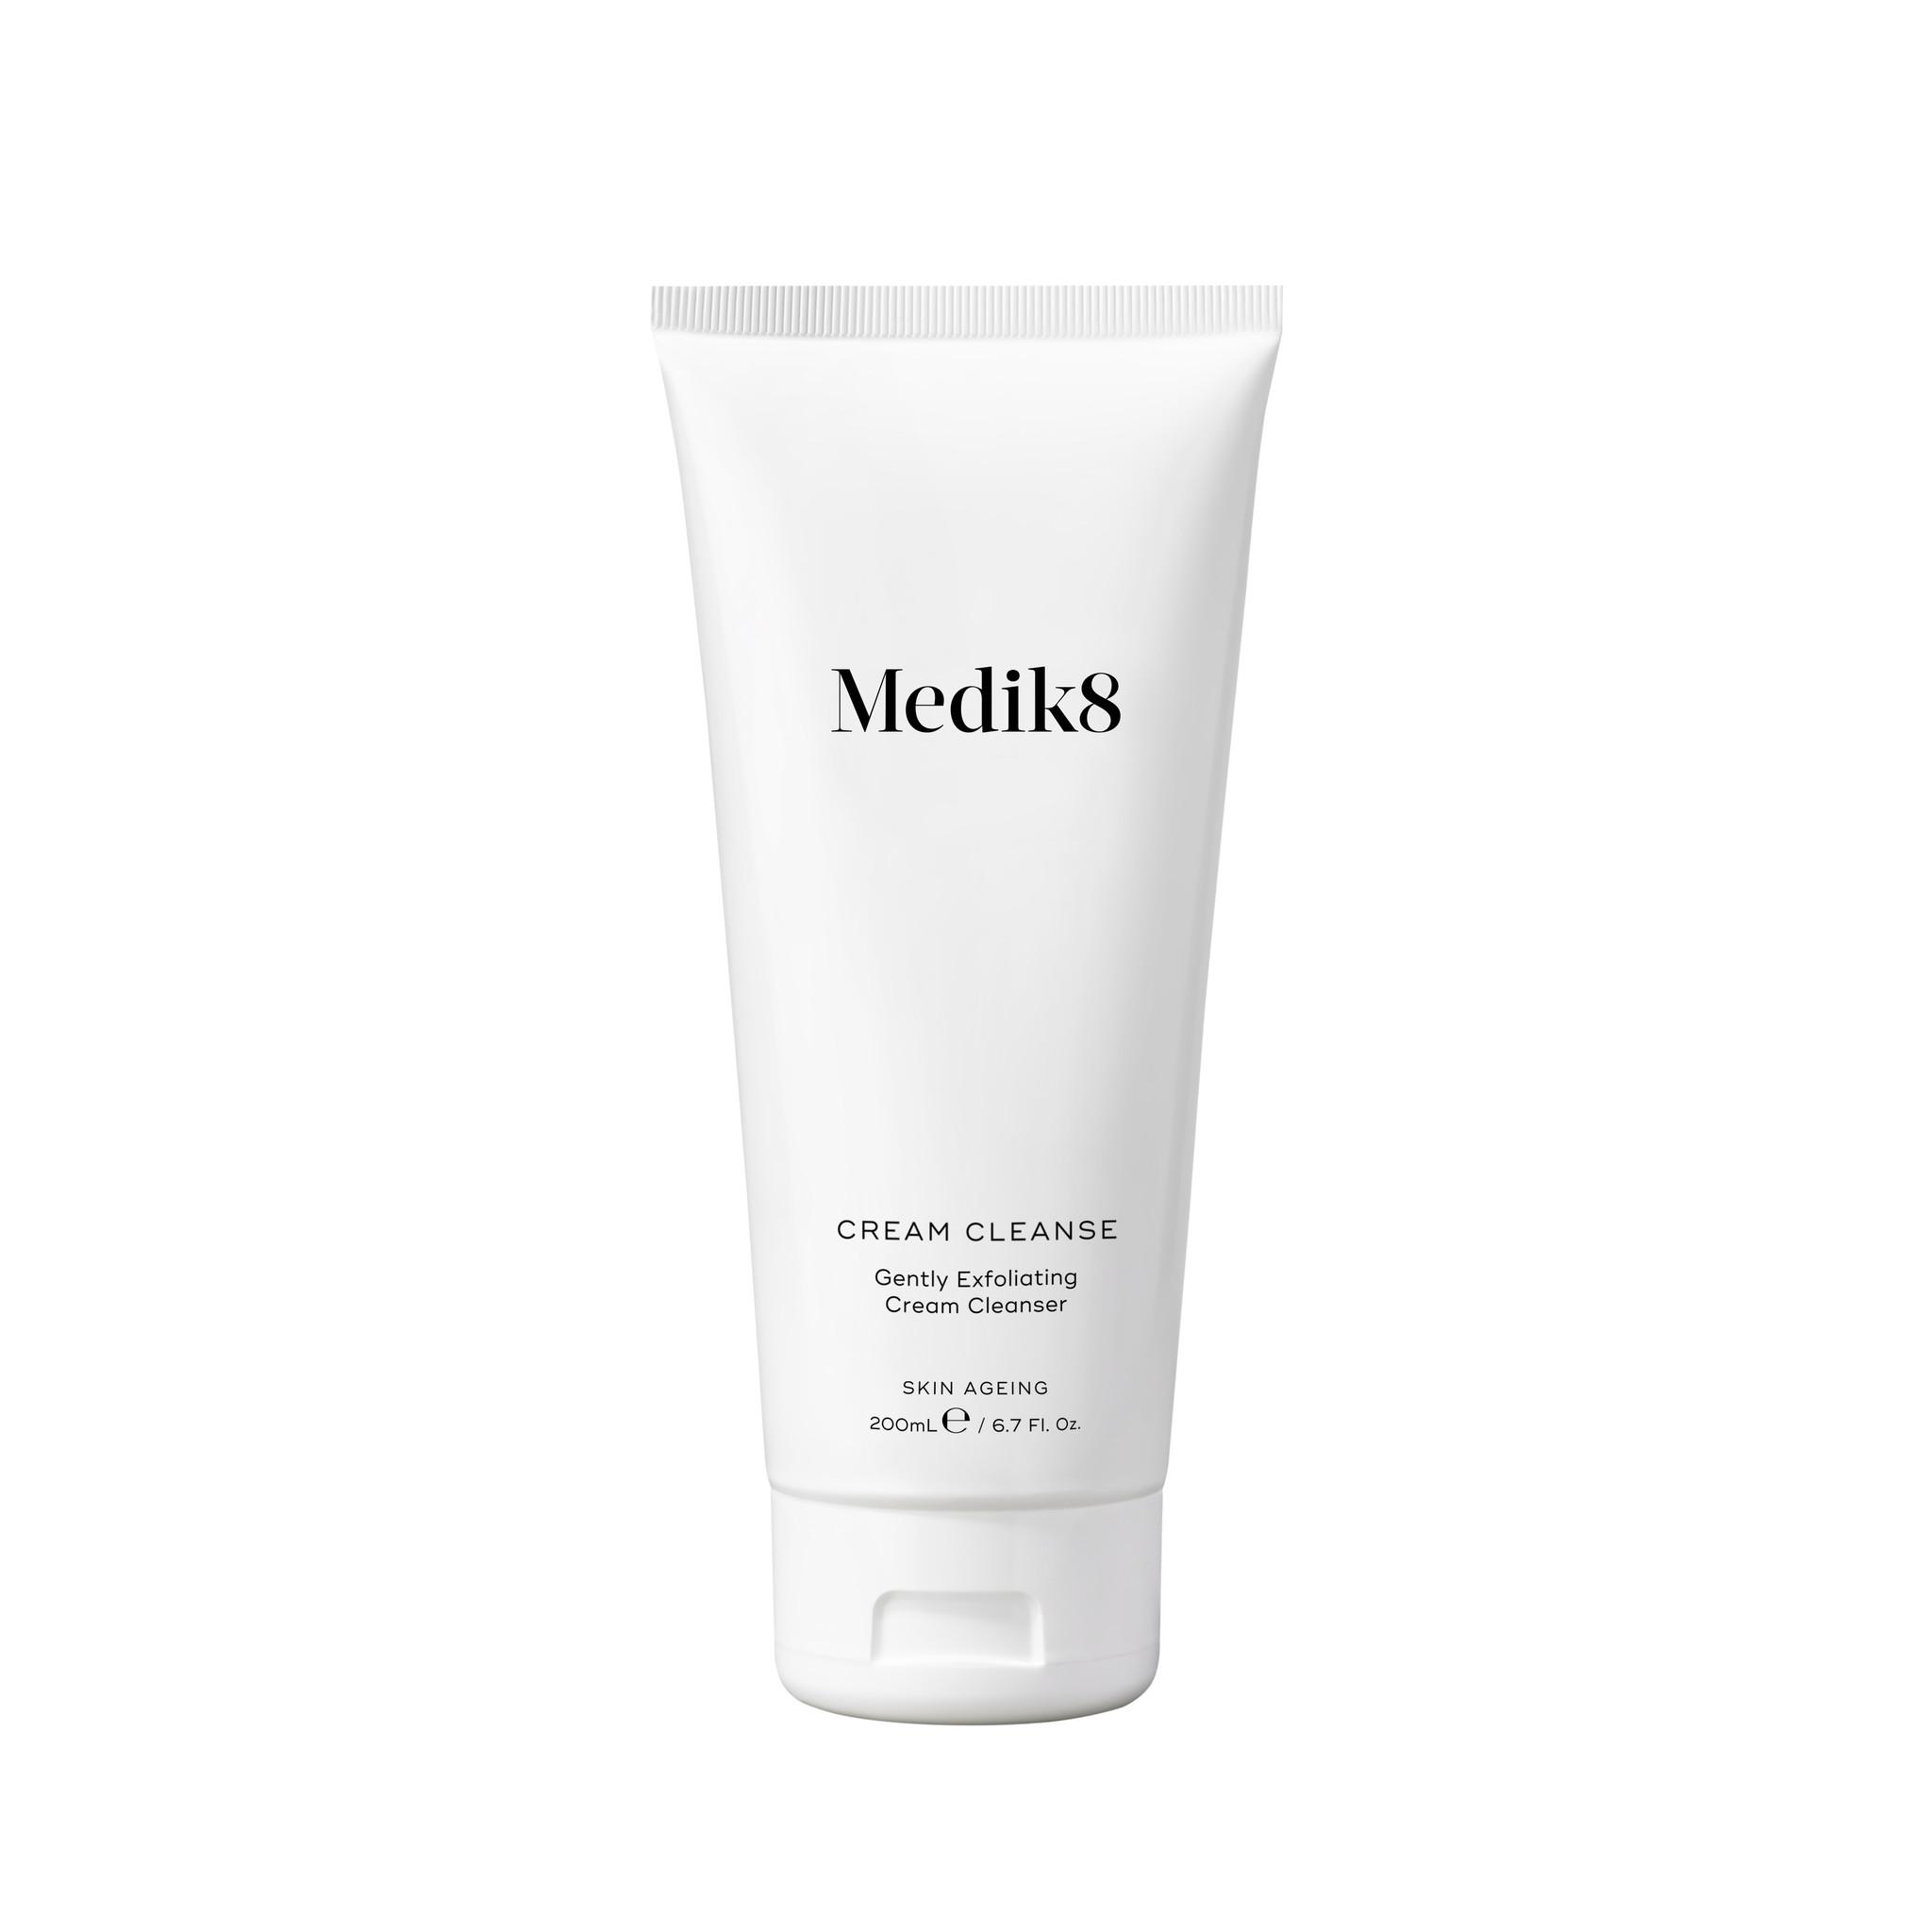 Medik8 Cream Cleanse | Gently Exfoliating Cream Cleanser | 200ml